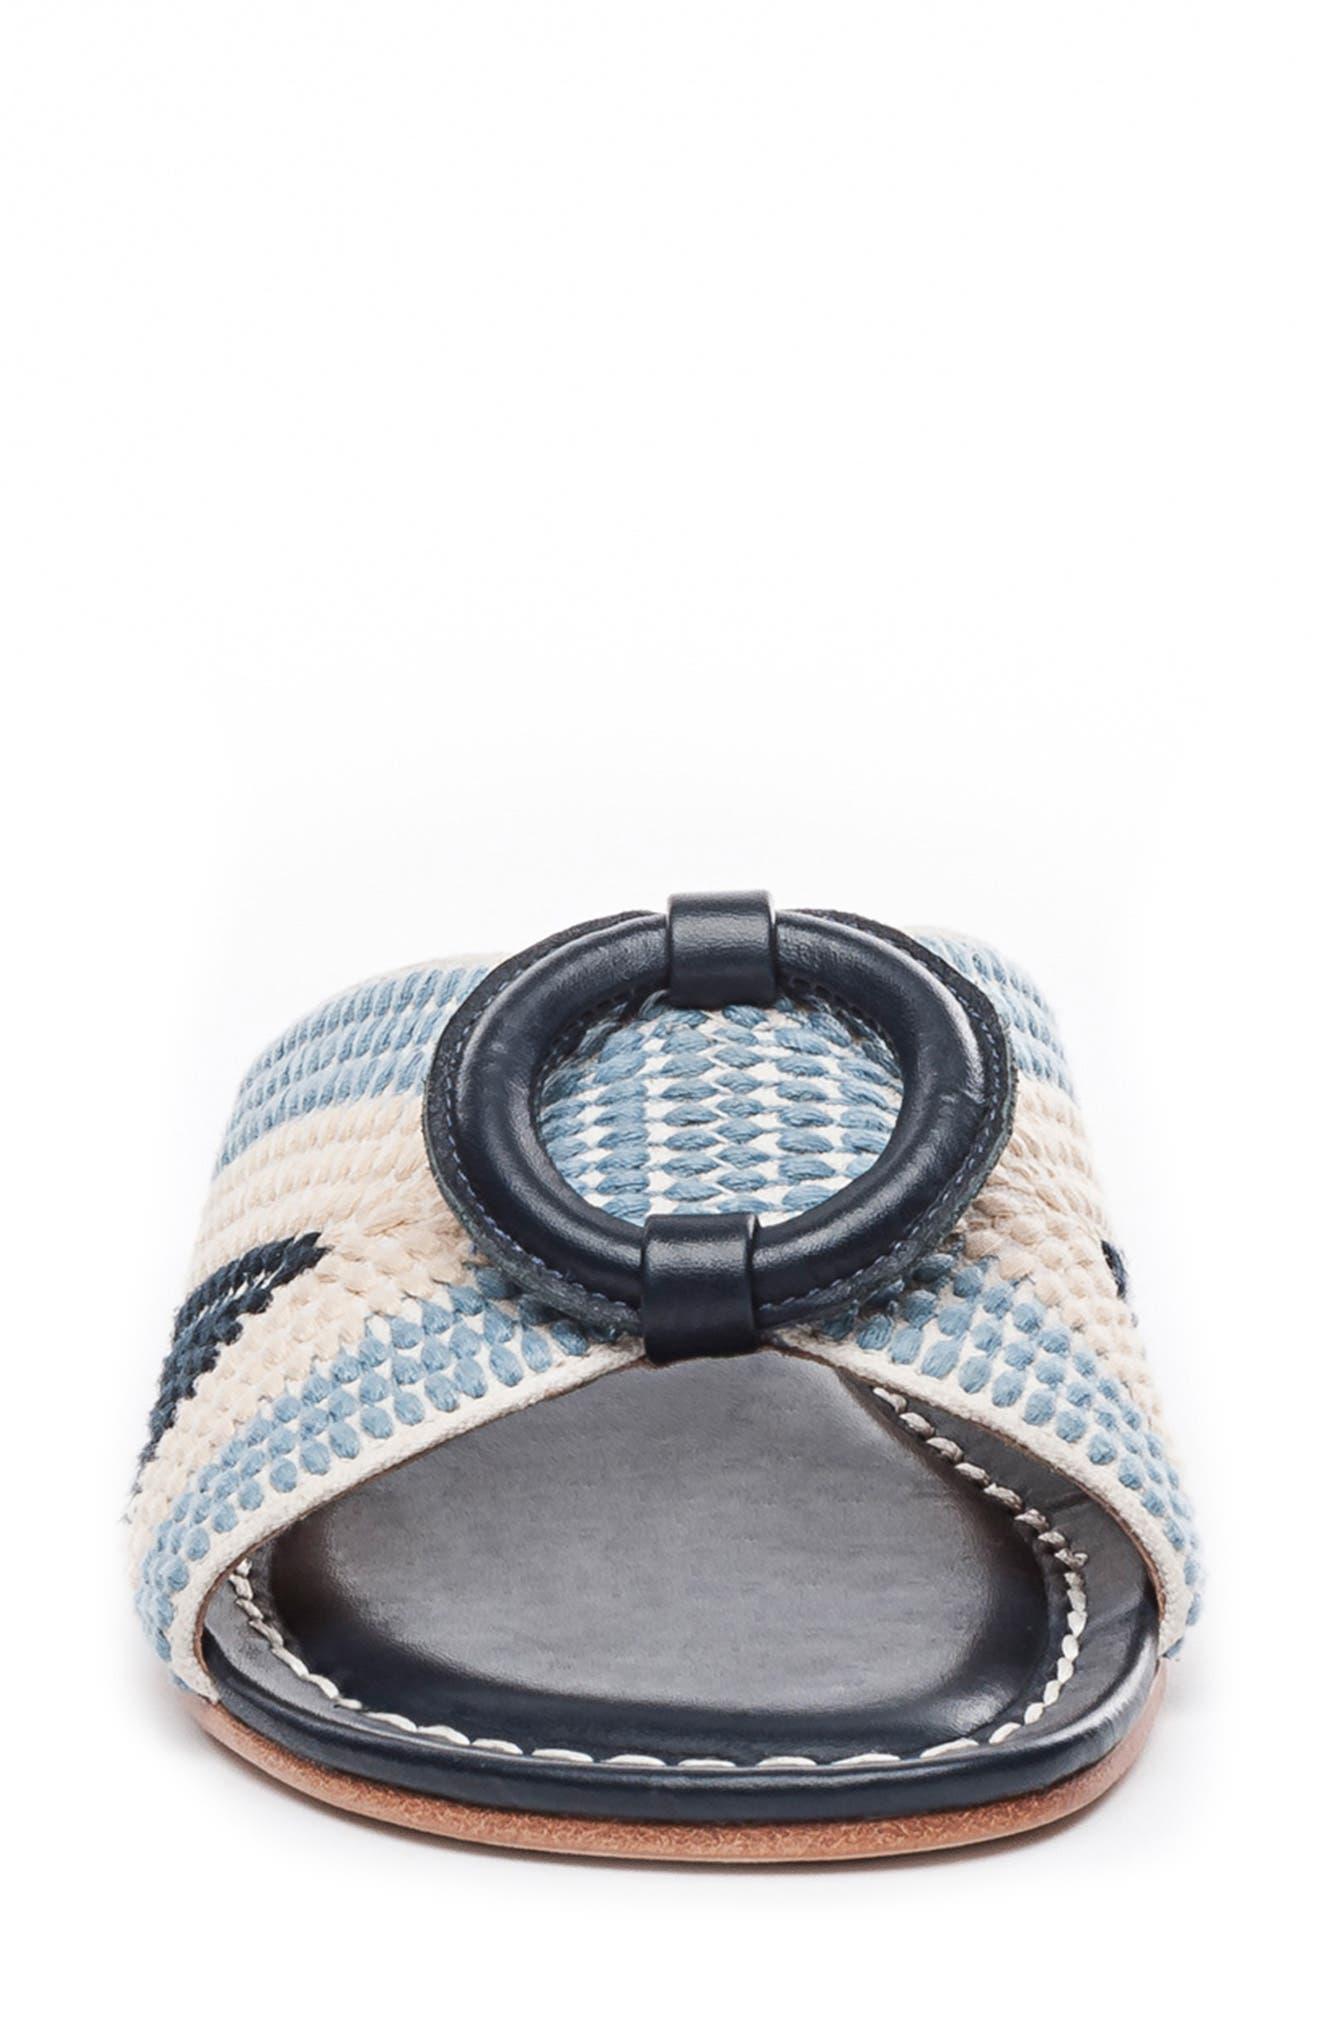 BERNARDO, Footwear Tay Slide Sandal, Alternate thumbnail 4, color, BLUE/ CREAM LEATHER